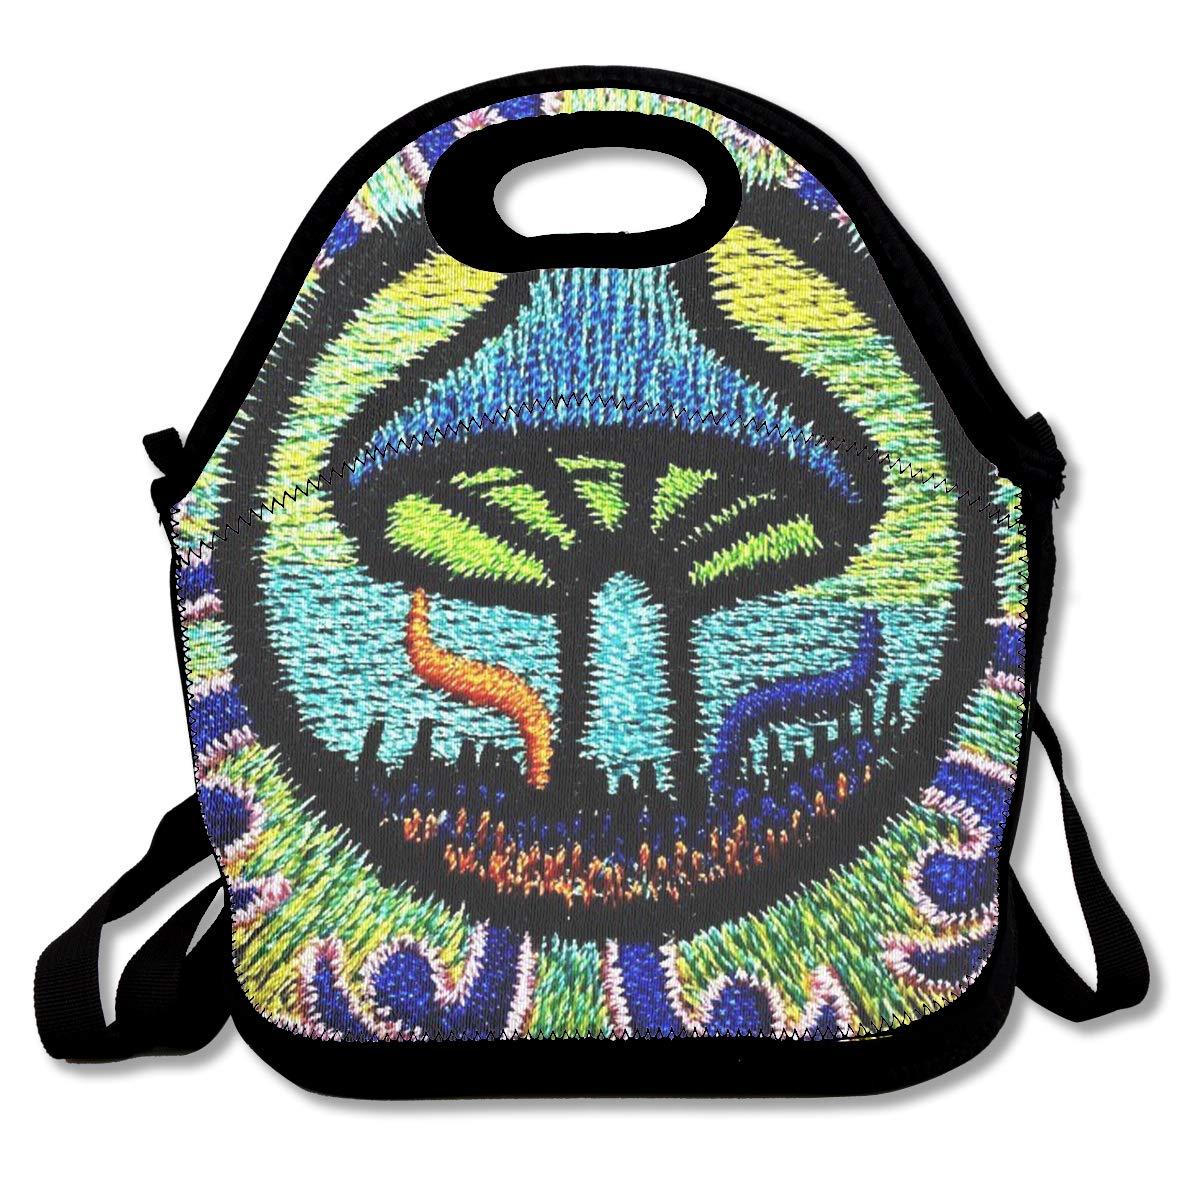 af3cb25aabe9 Amazon.com: Pilsyv8s5 Mandala Magic Mushroom Goa Psychedelic Lunch ...